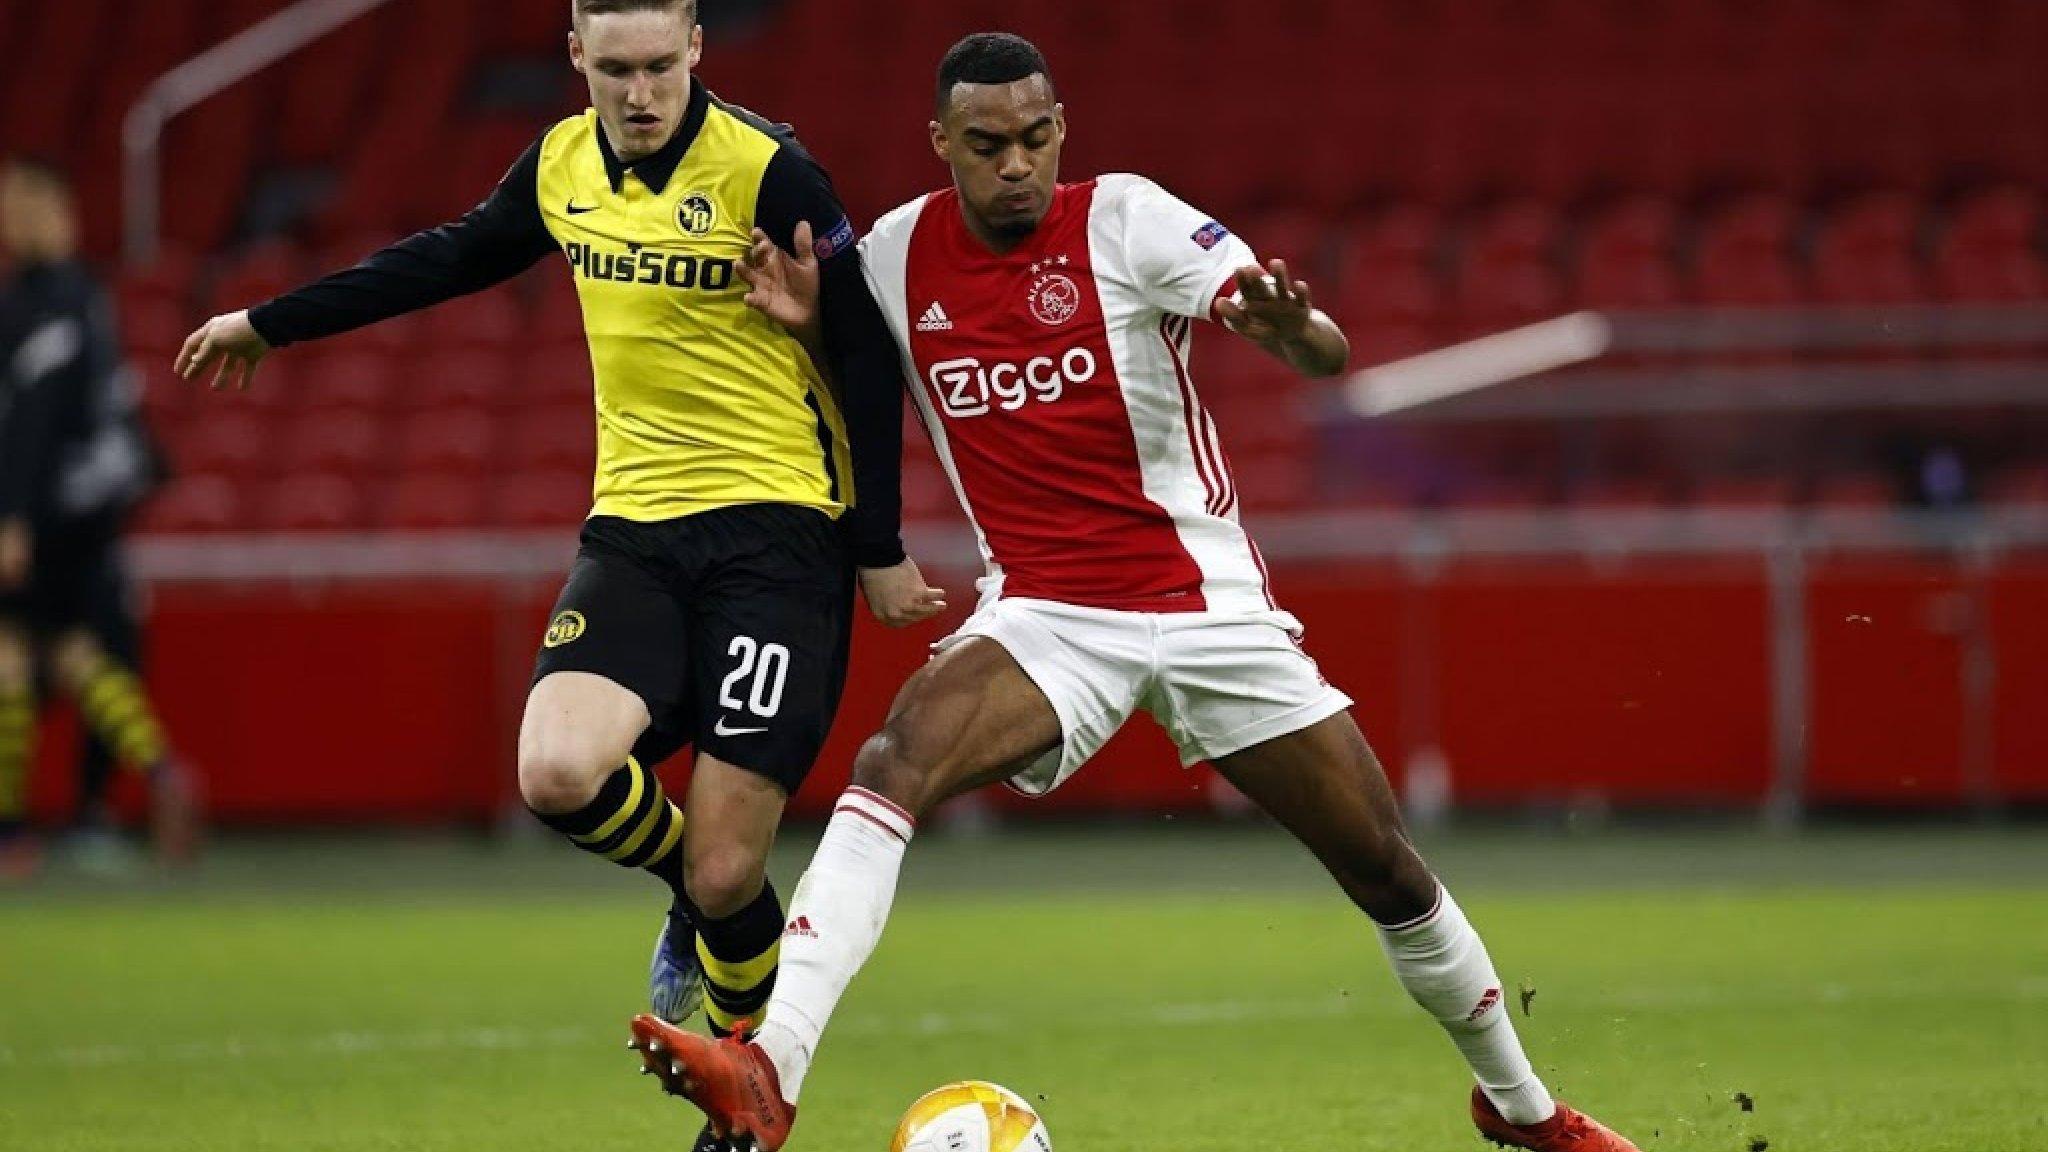 Ajax defends a comfortable lead over Young Boys - Ruetir